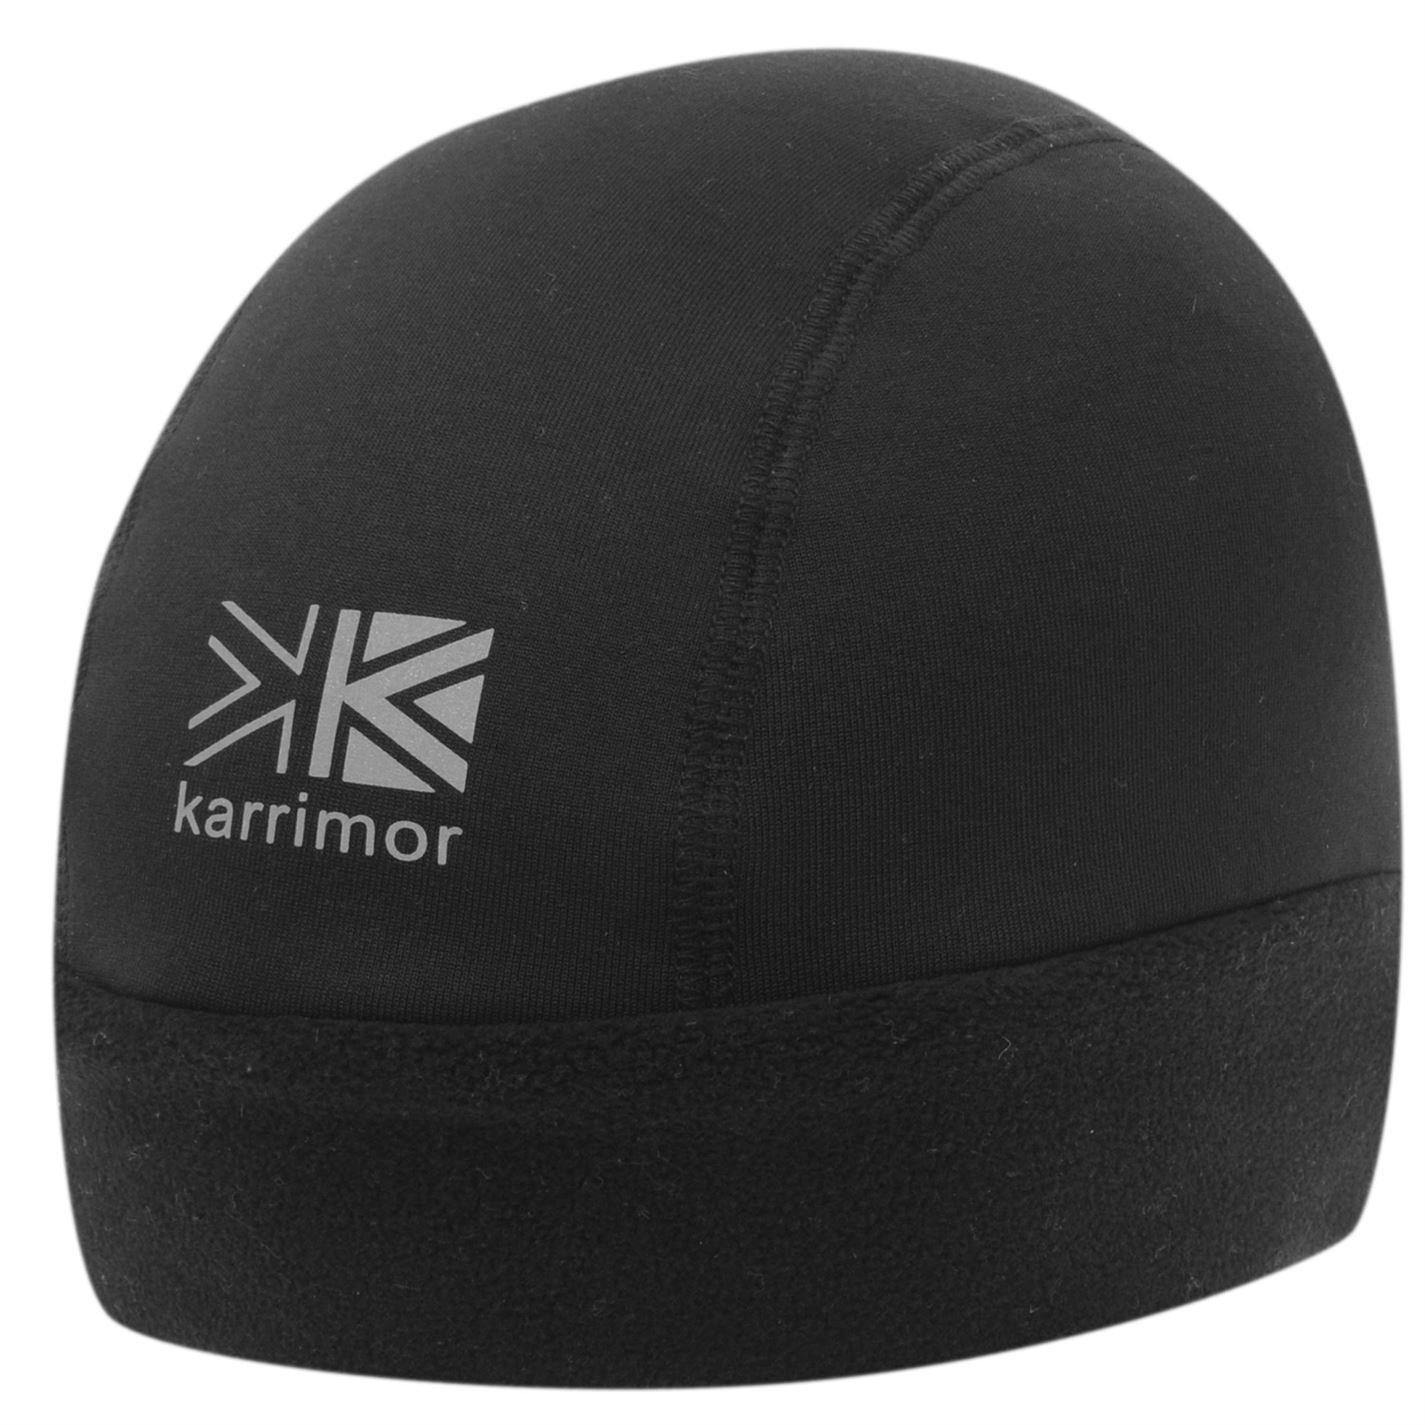 Karrimor Thermal Outdoor Hat Beanie Cap Headwear Accessories